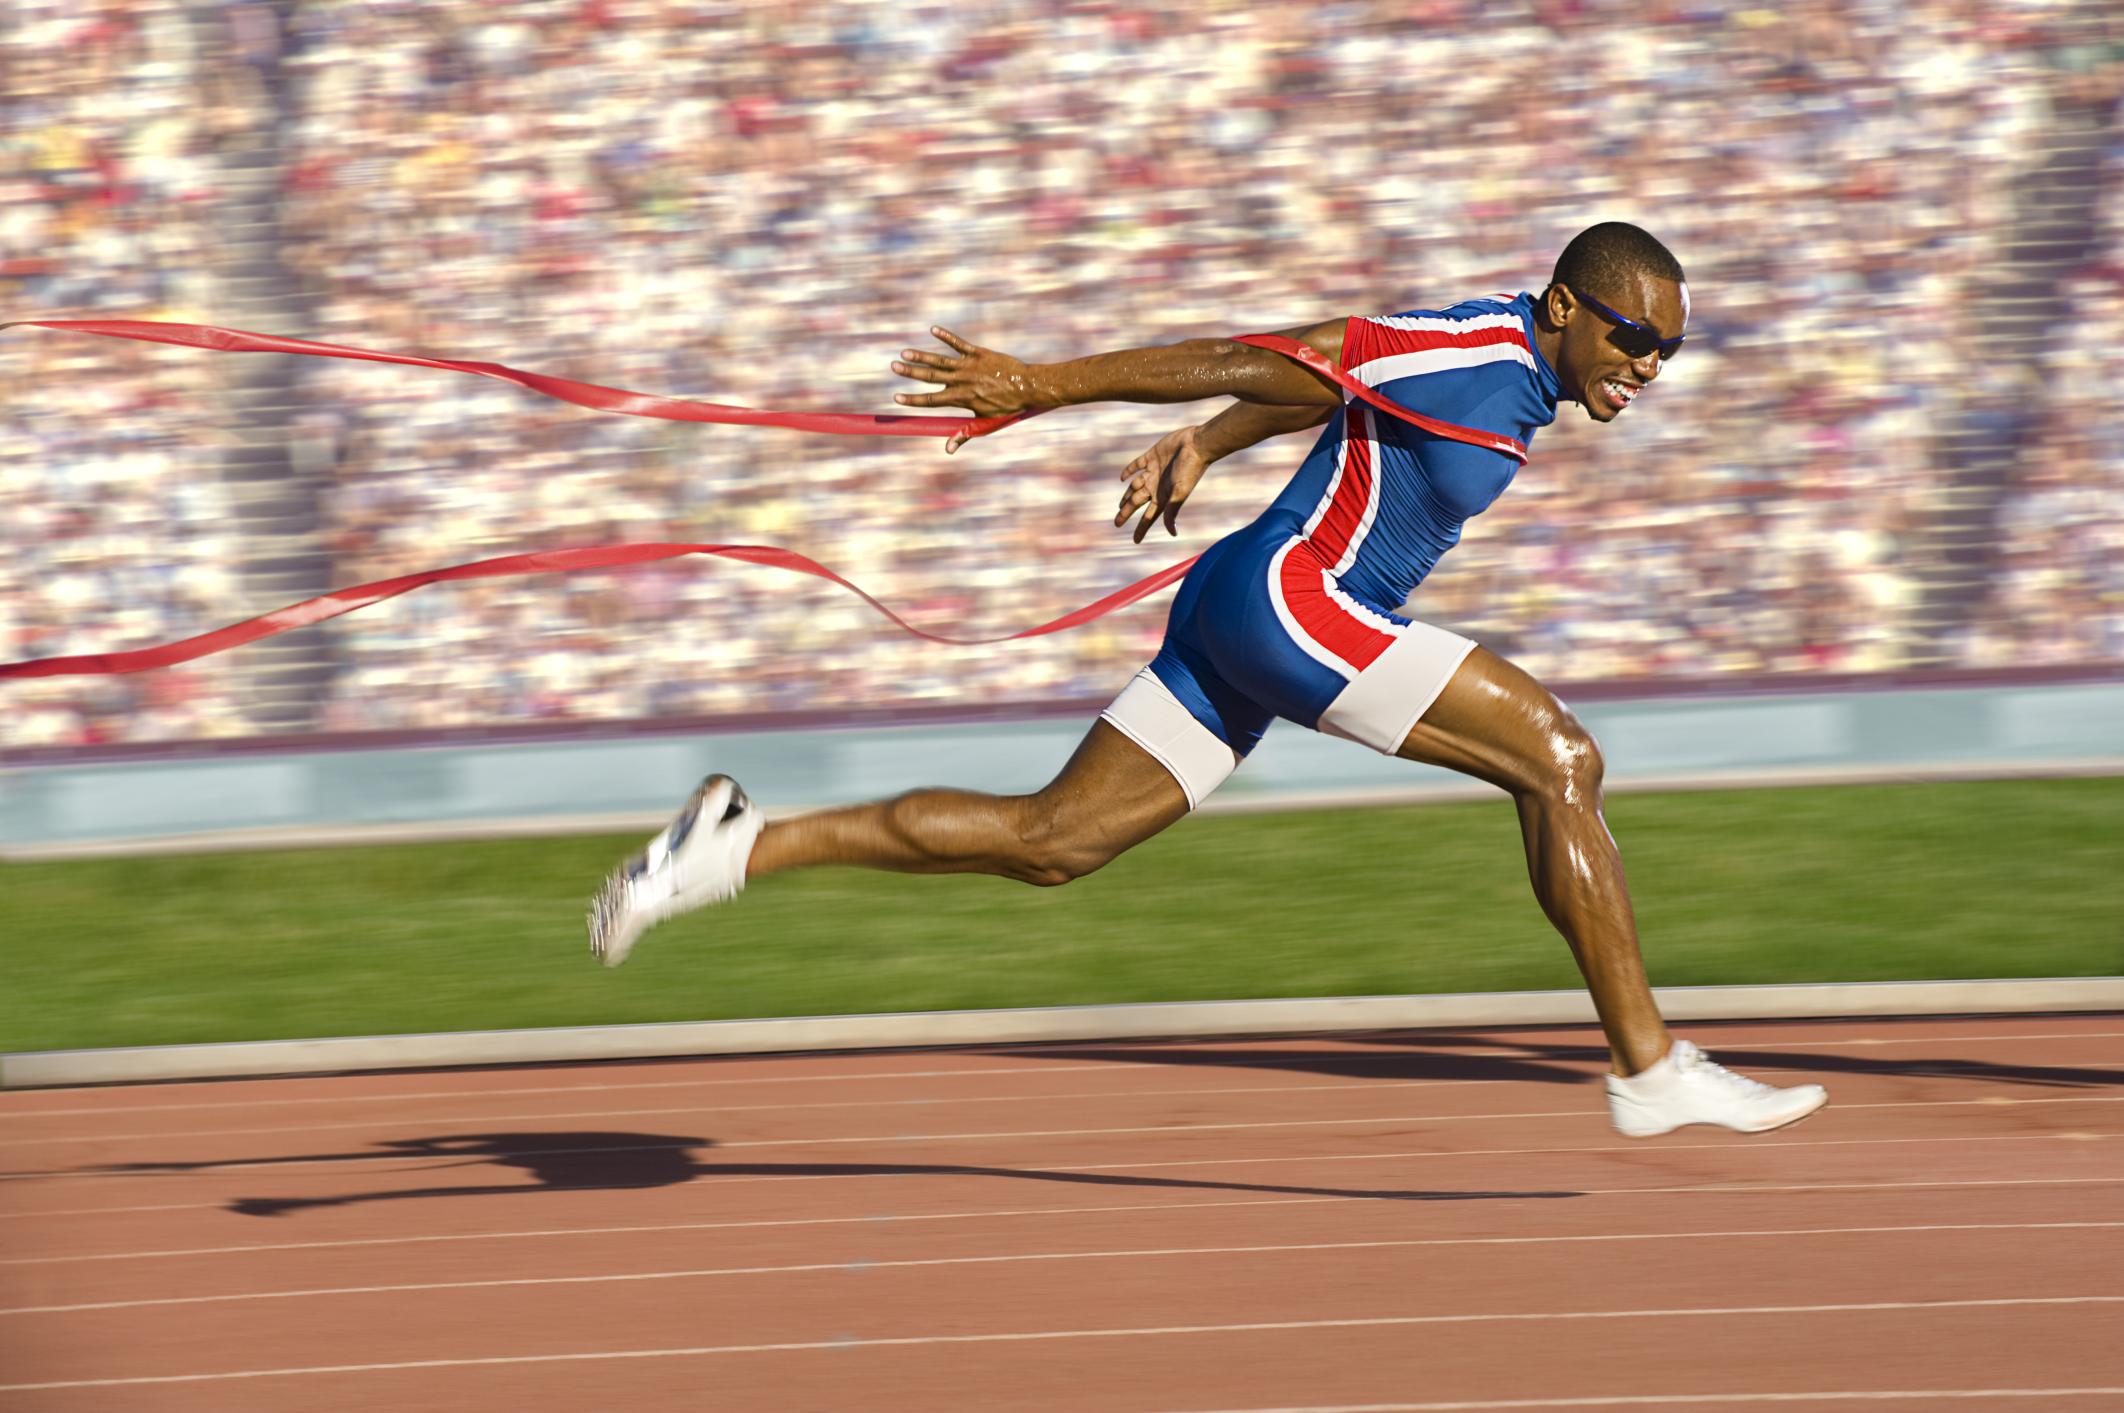 Sprinter Finish Line